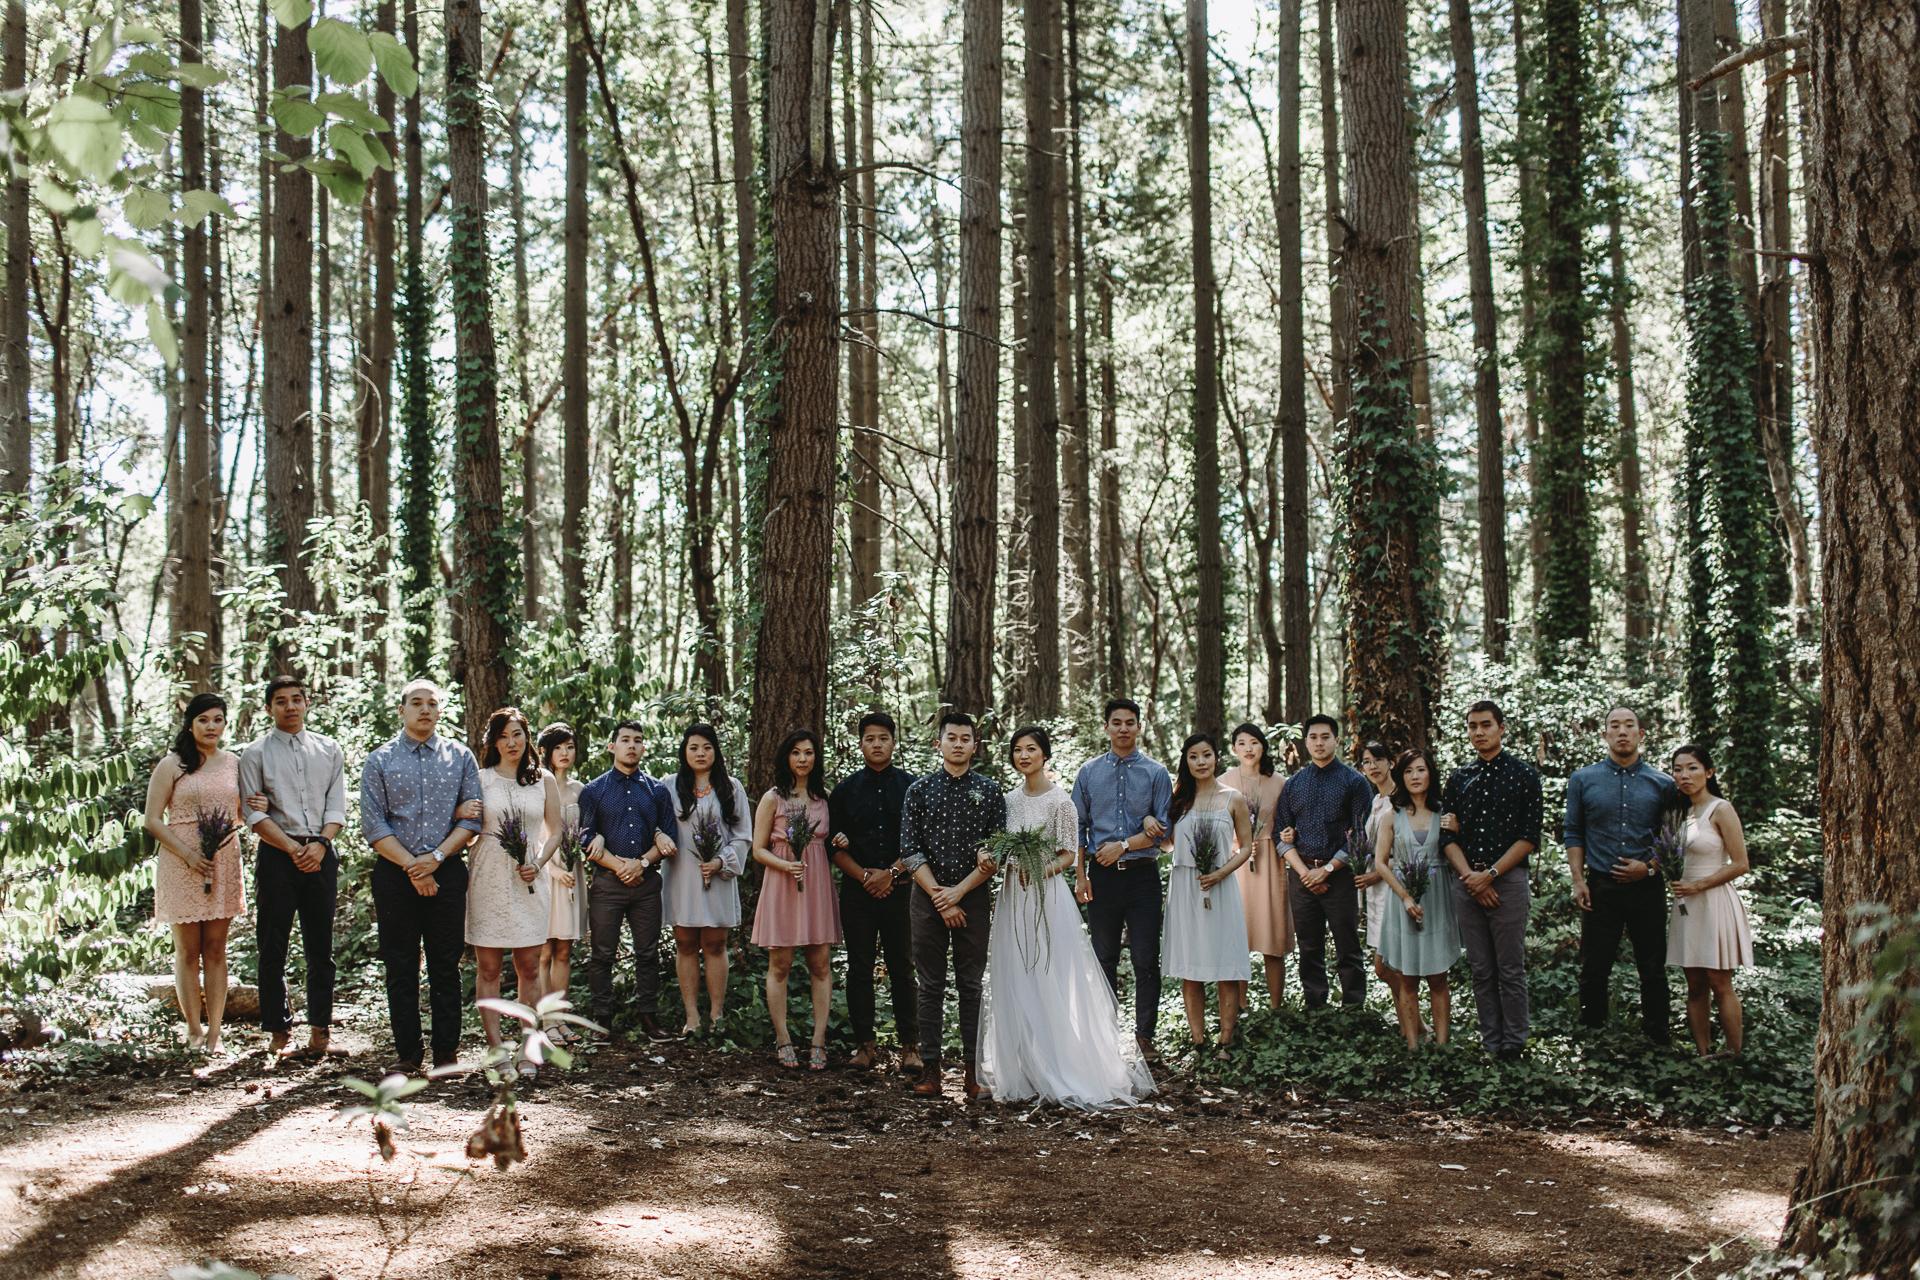 jess-hunter-seattle-artistic-wedding-photographer-4198.jpg